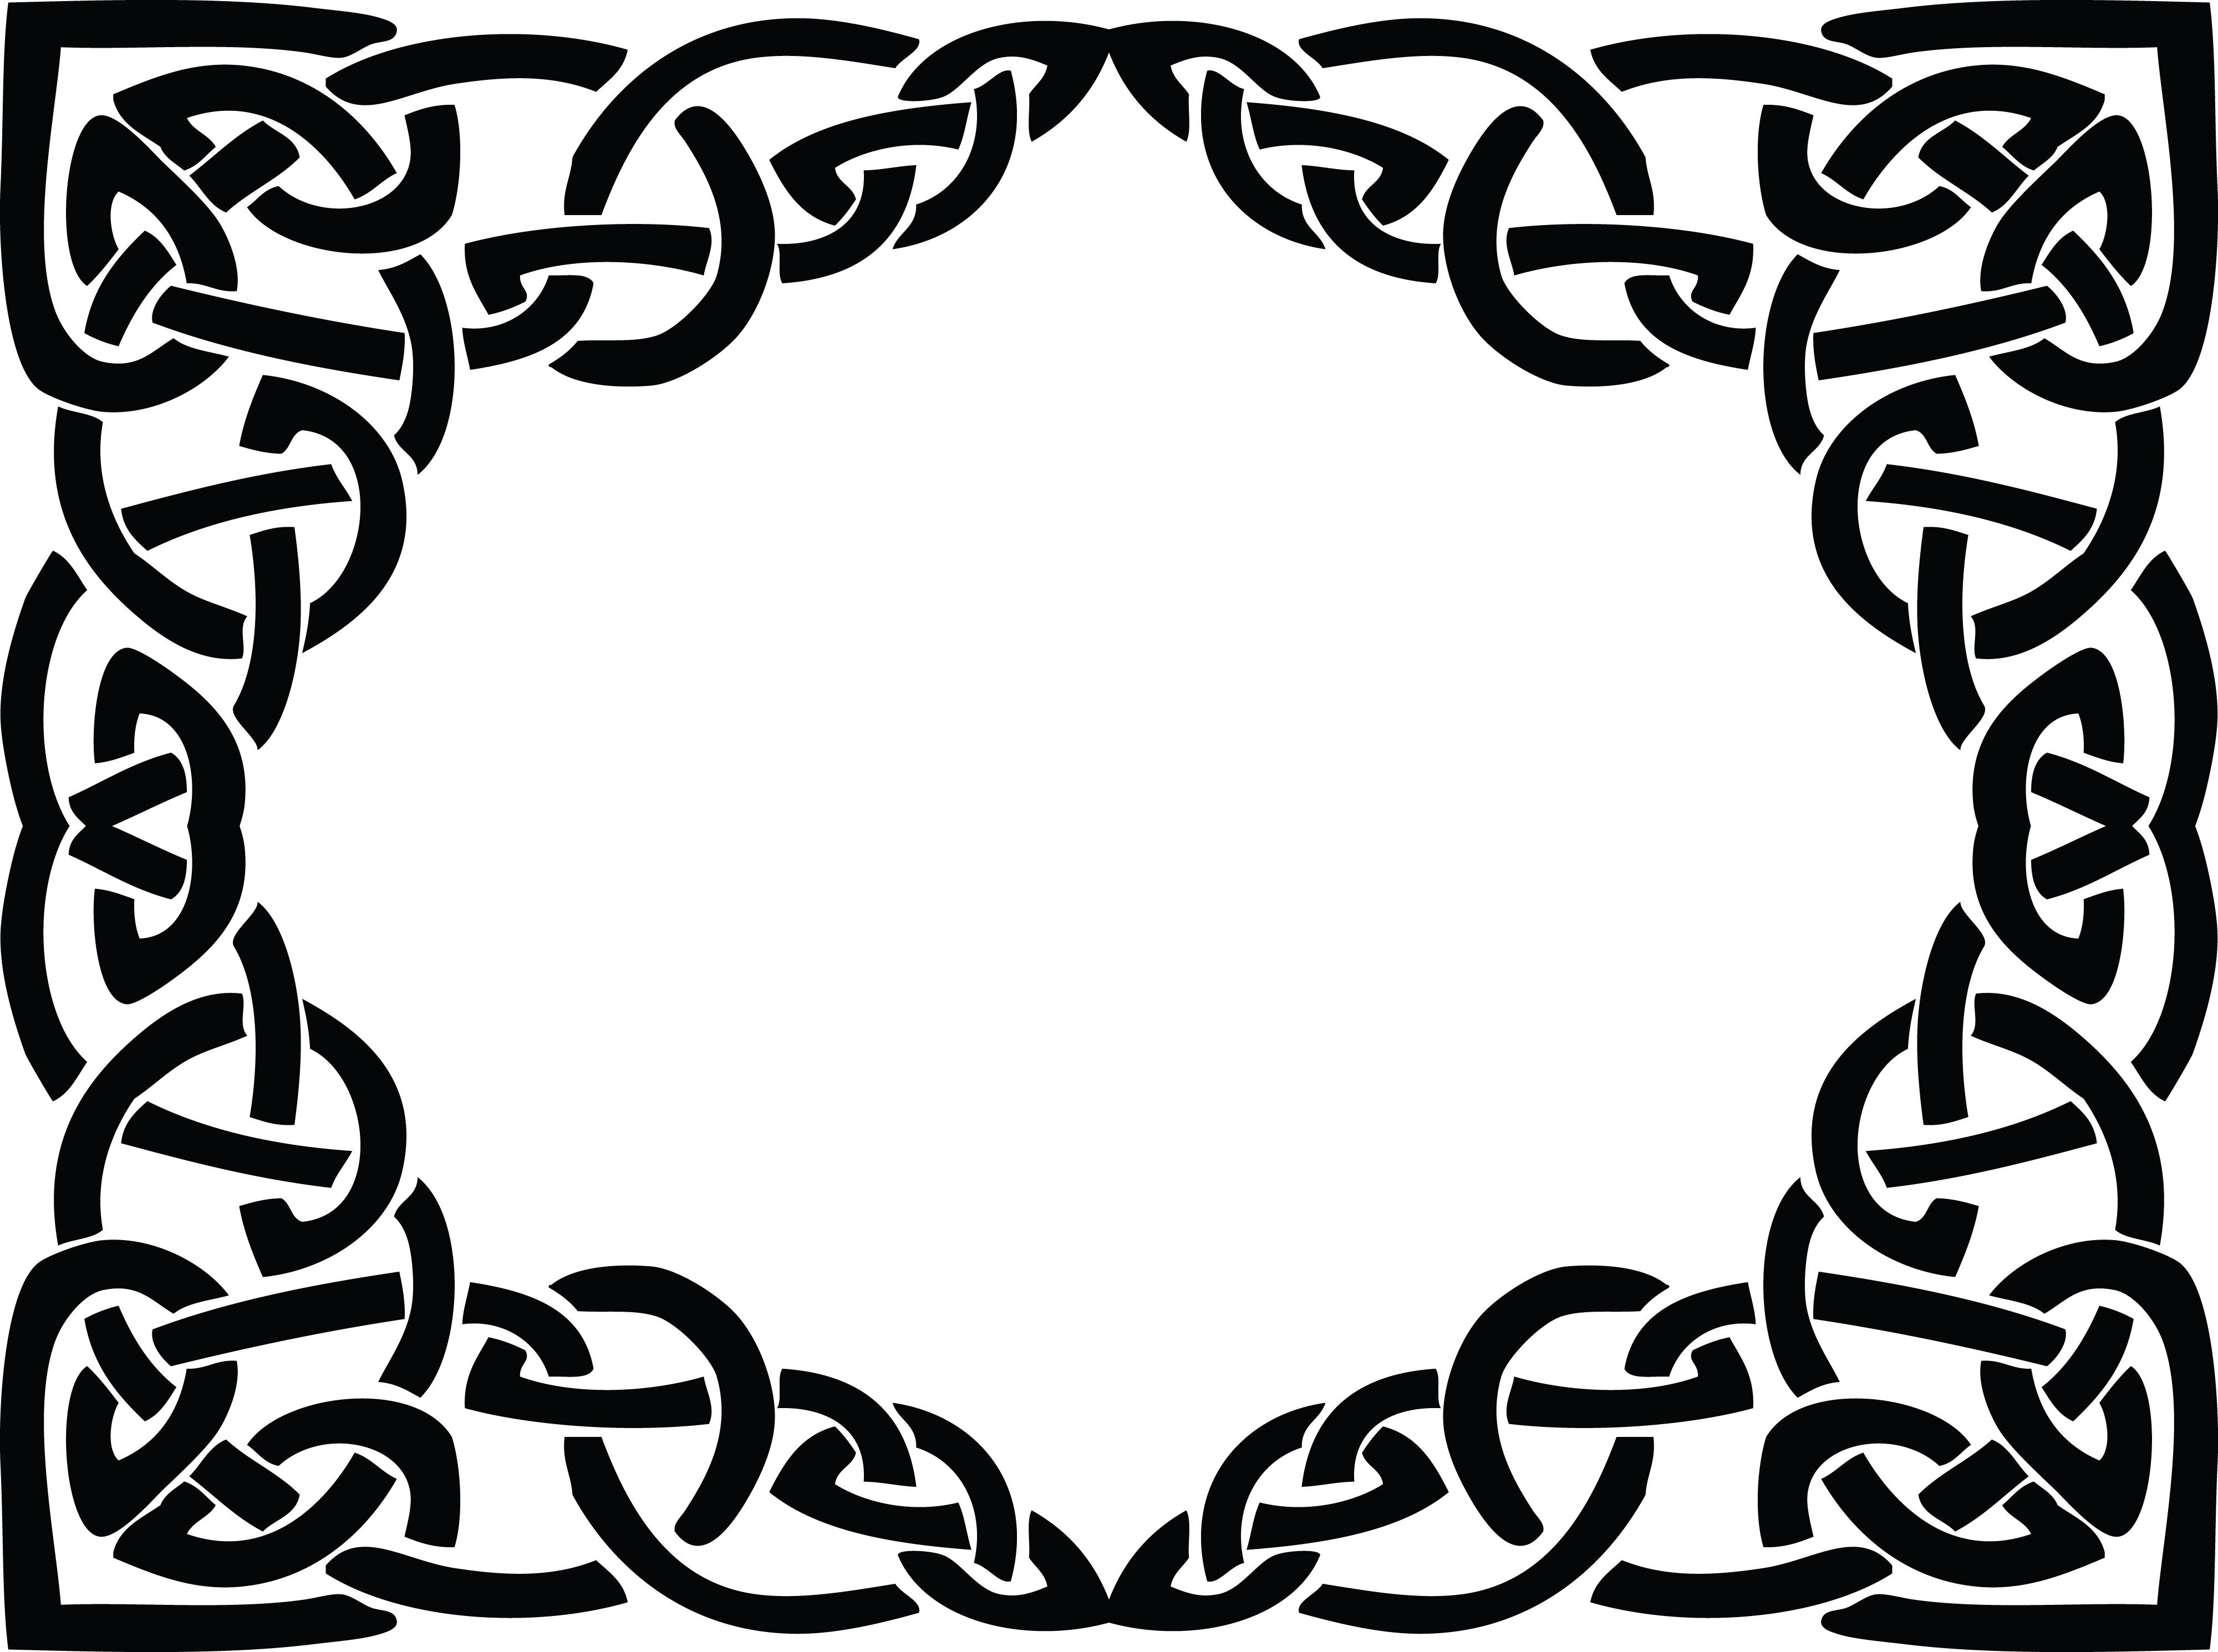 frame border design. Free Clipart Of A Celtic Rectangle Frame Border Design Element In Black And White Knots